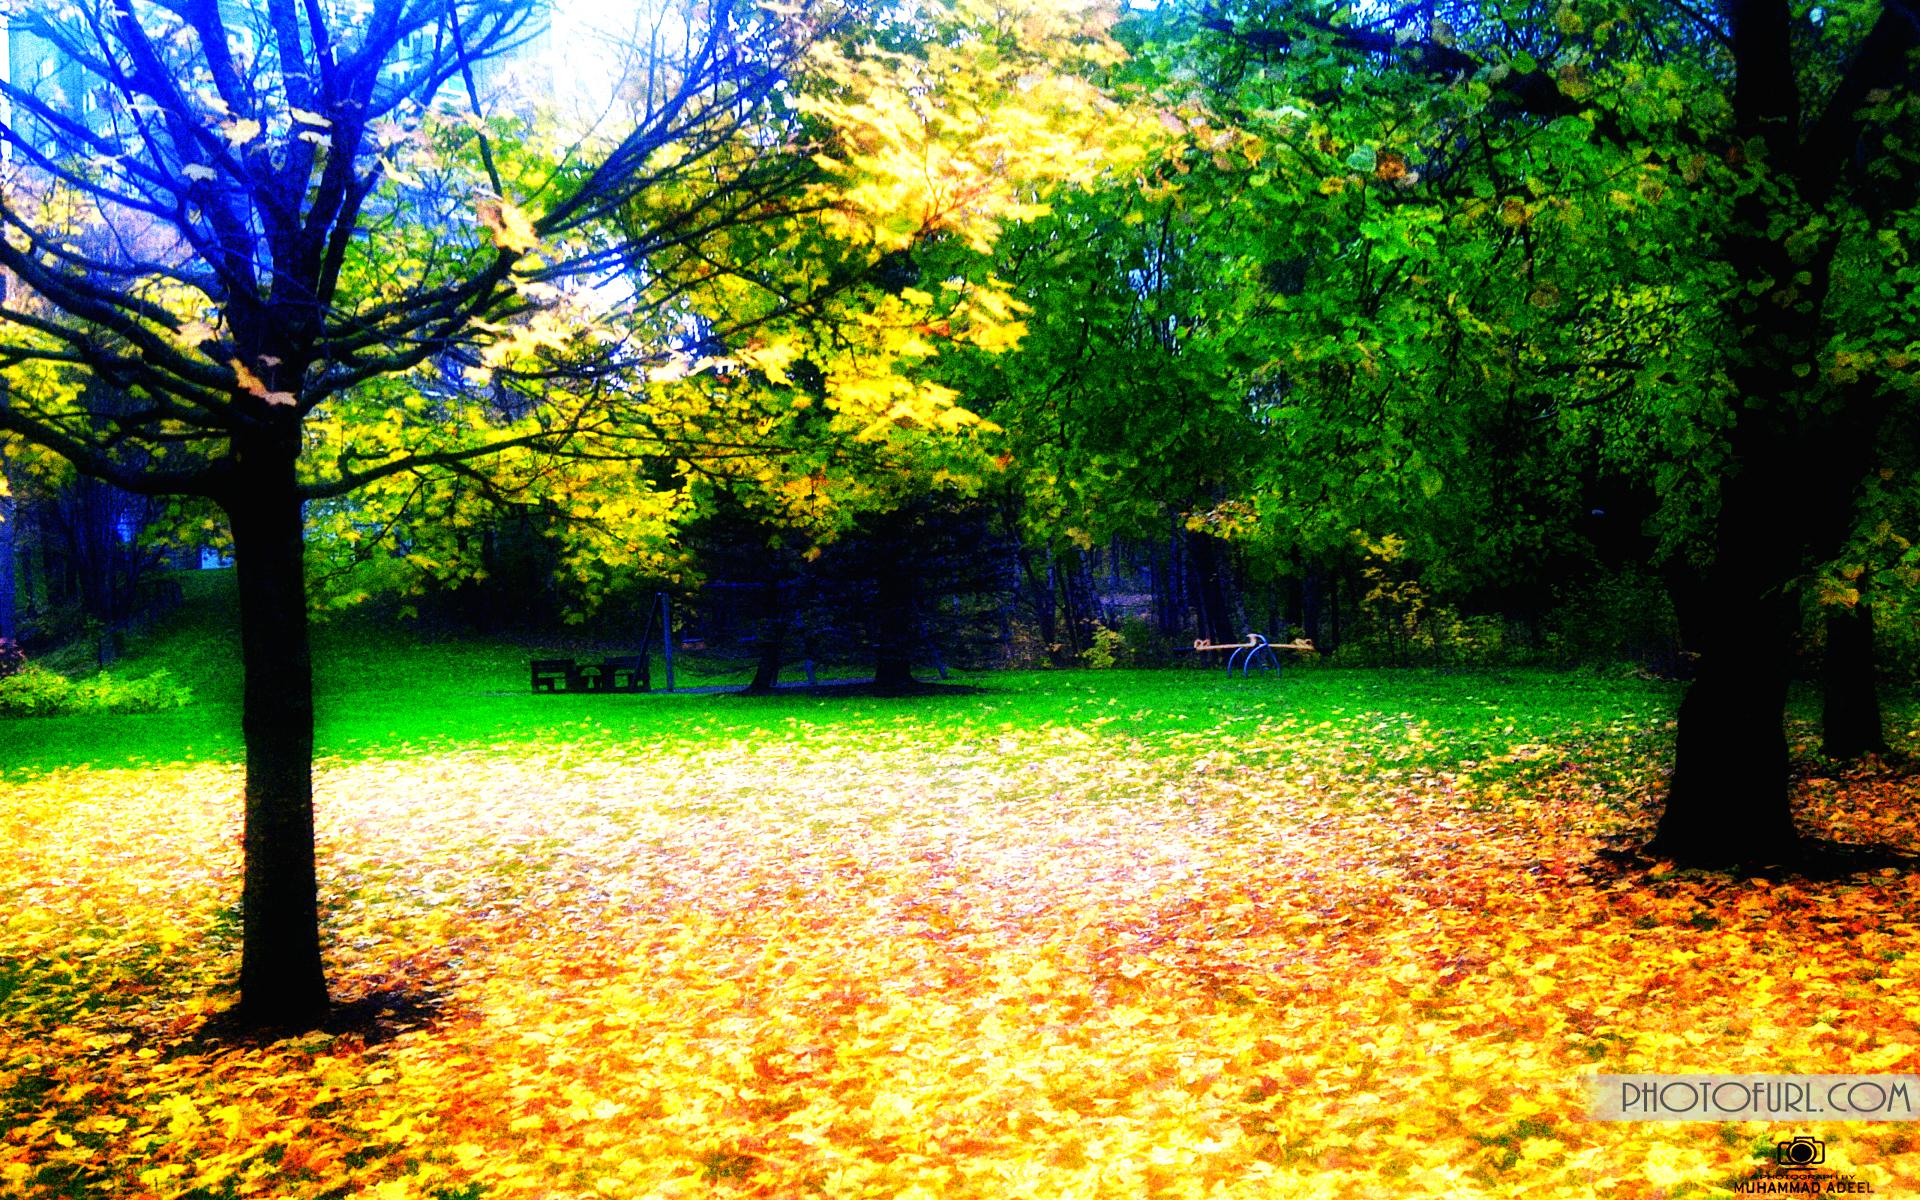 desktop wallpapers nature wallpaper photo beautiful photographic 1920x1200